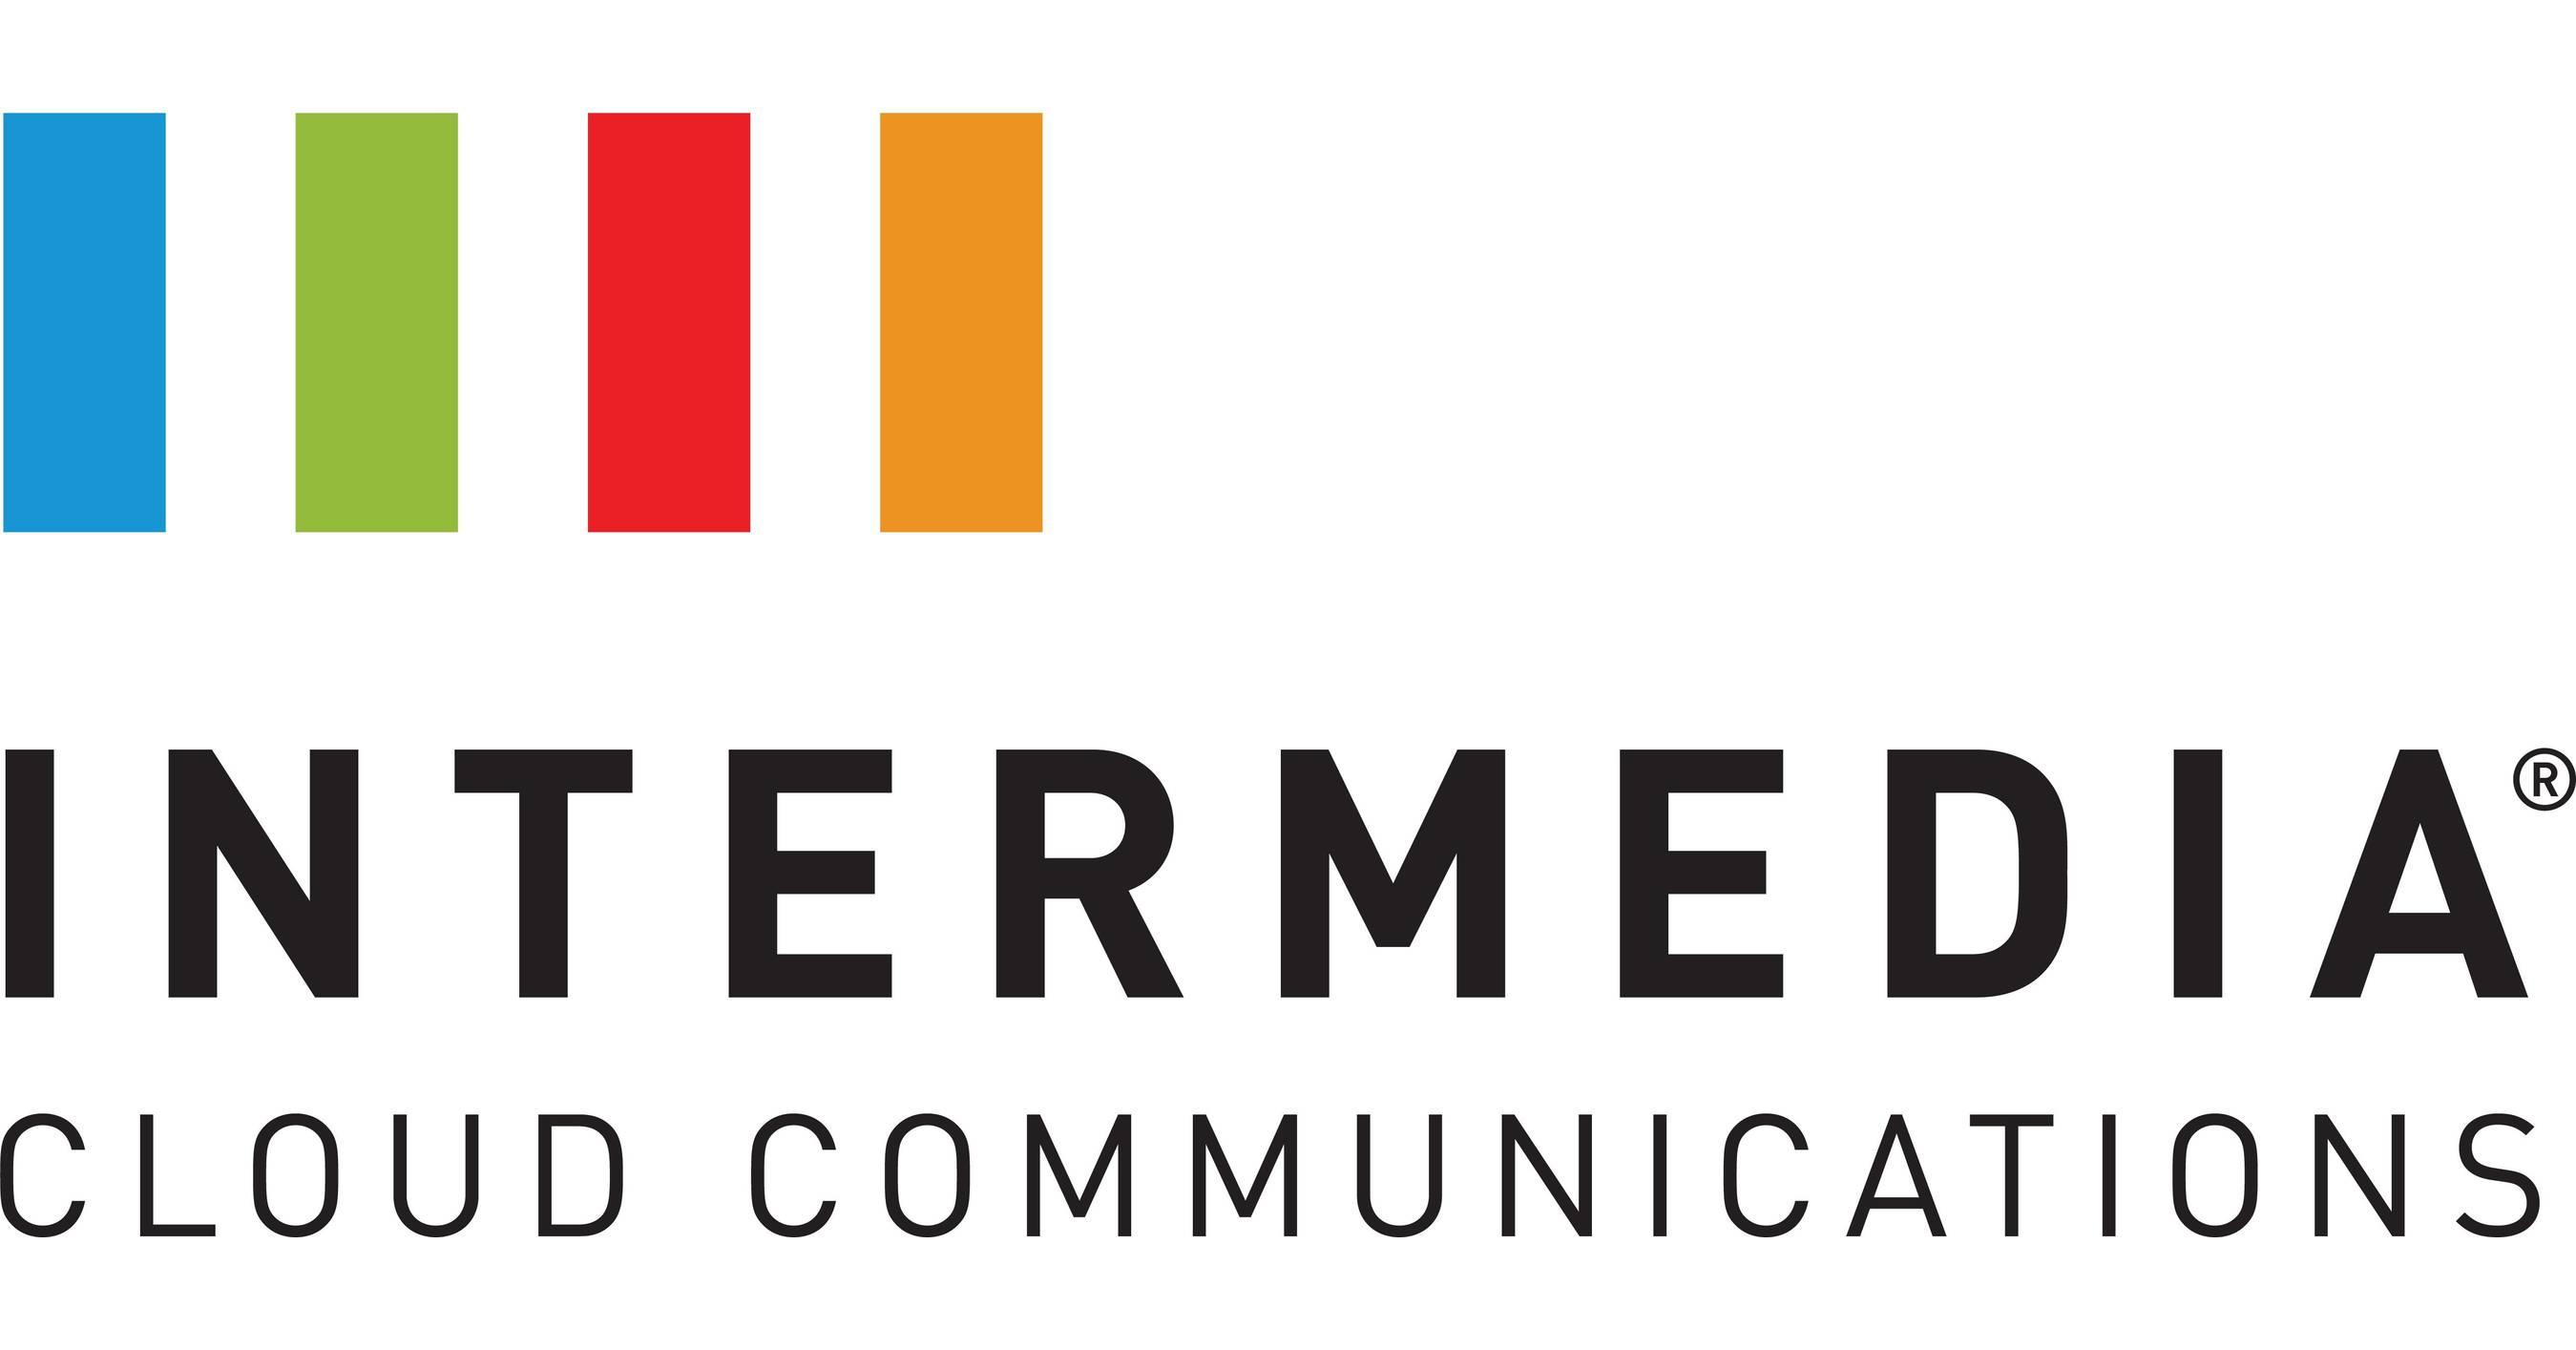 Intermedia Releases Extend API Platform, Expanding Integration of Award-Winning Communications Capabilities to Business Applications - RapidAPI